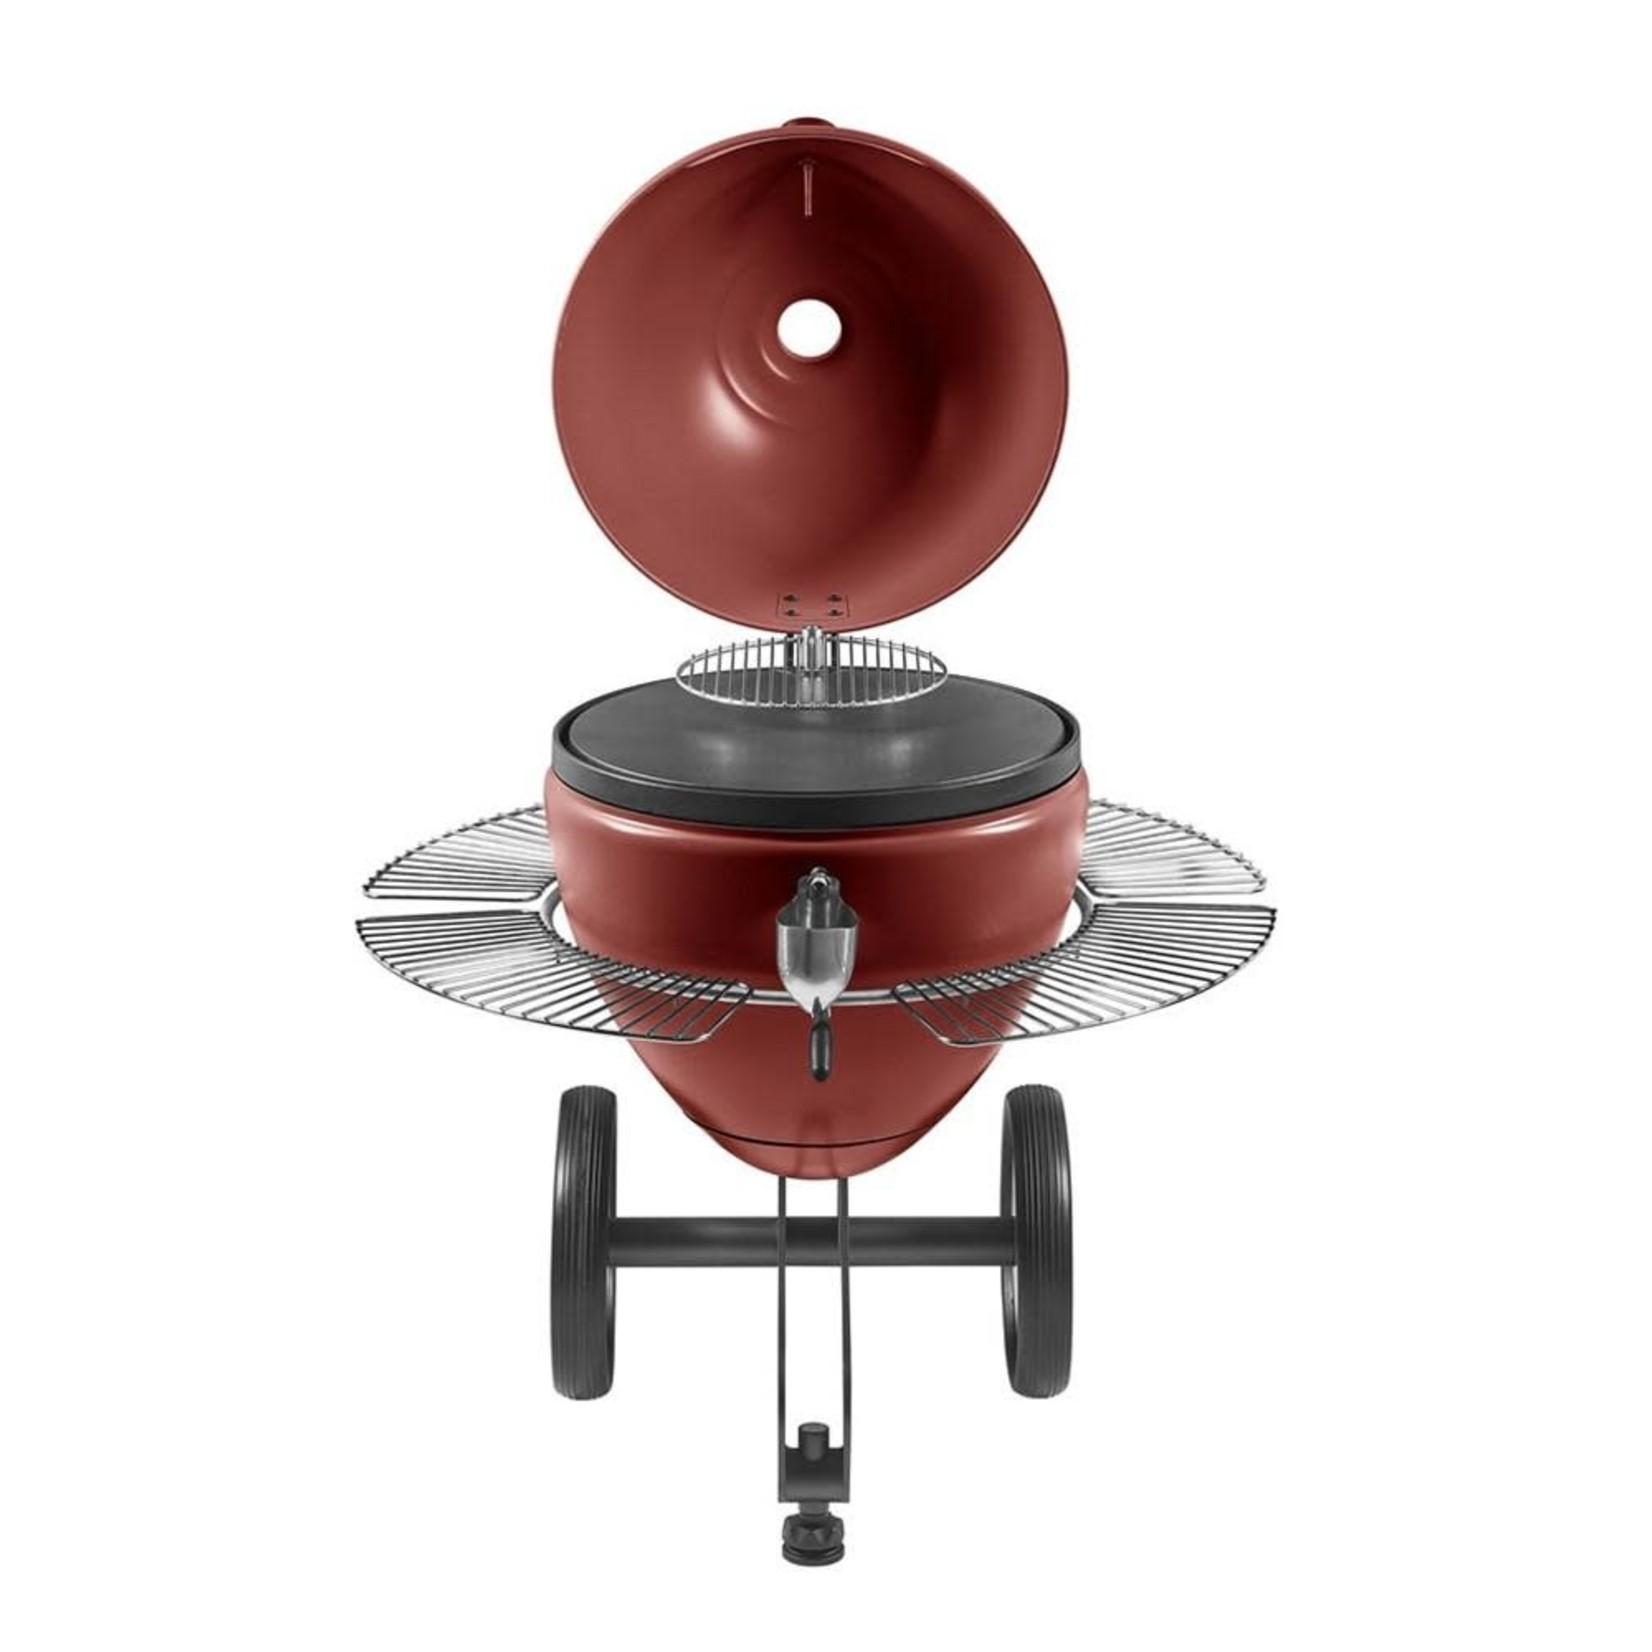 POQ pellet grill PBQ / Atmo-Sfera Zijdelingse Rooster per stuk